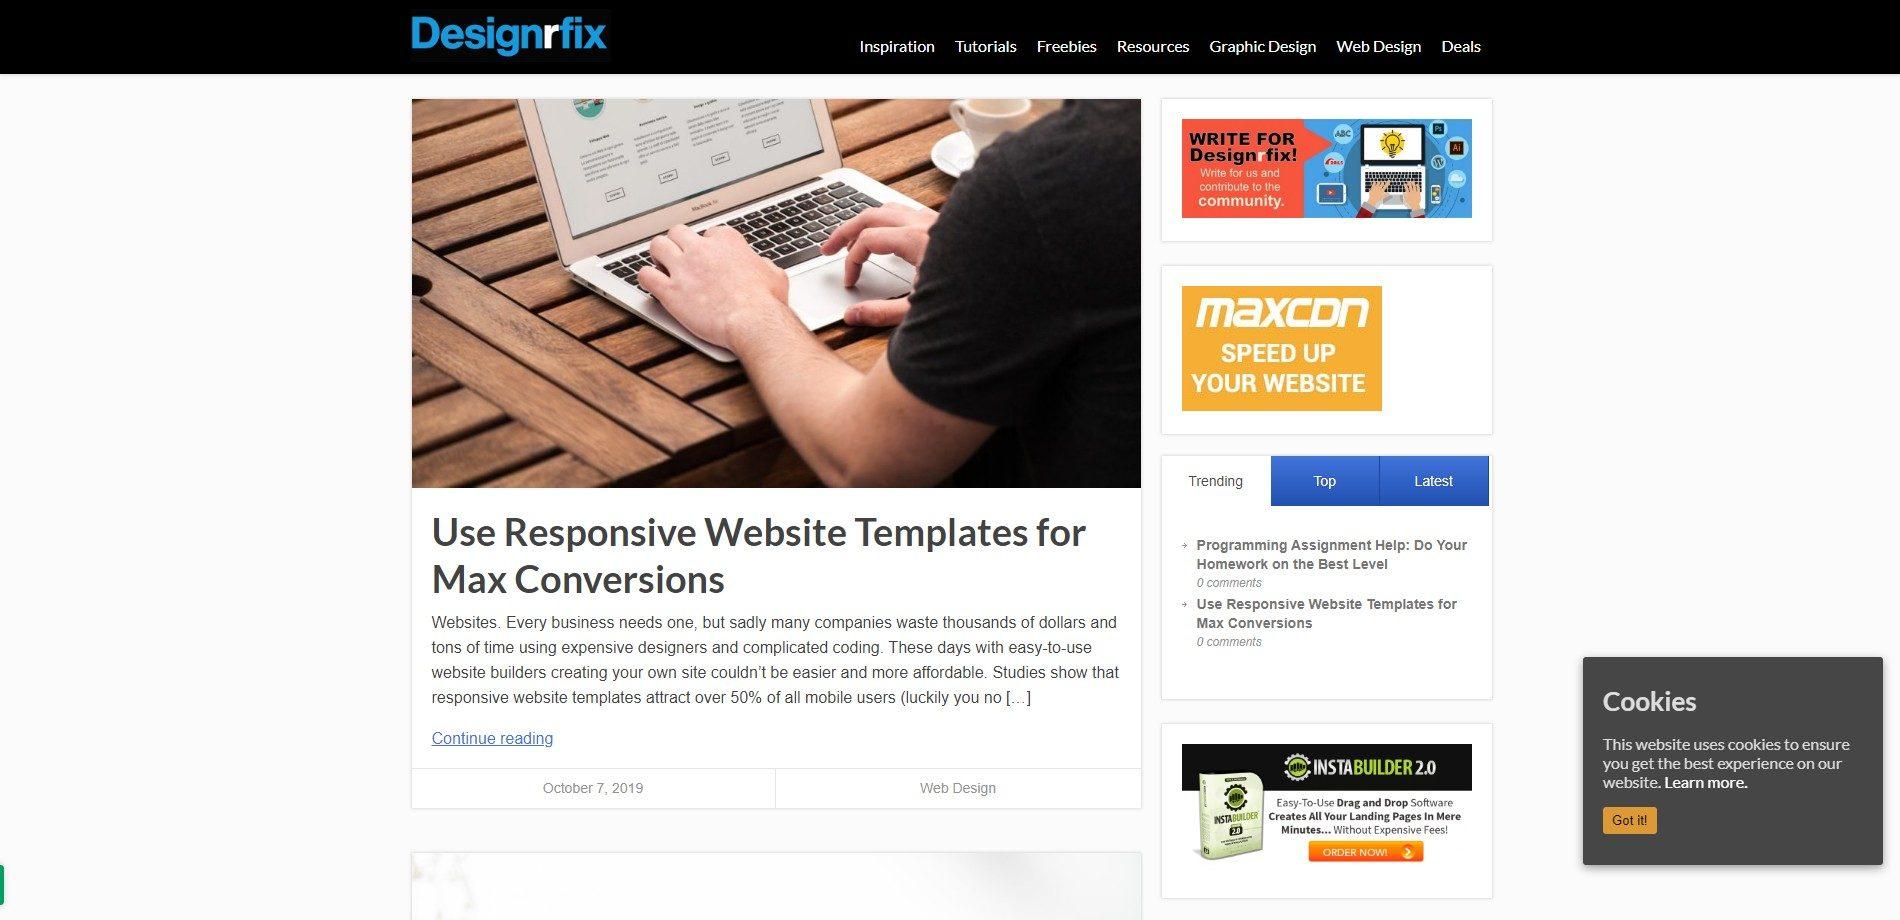 Designrfix - Web design blog